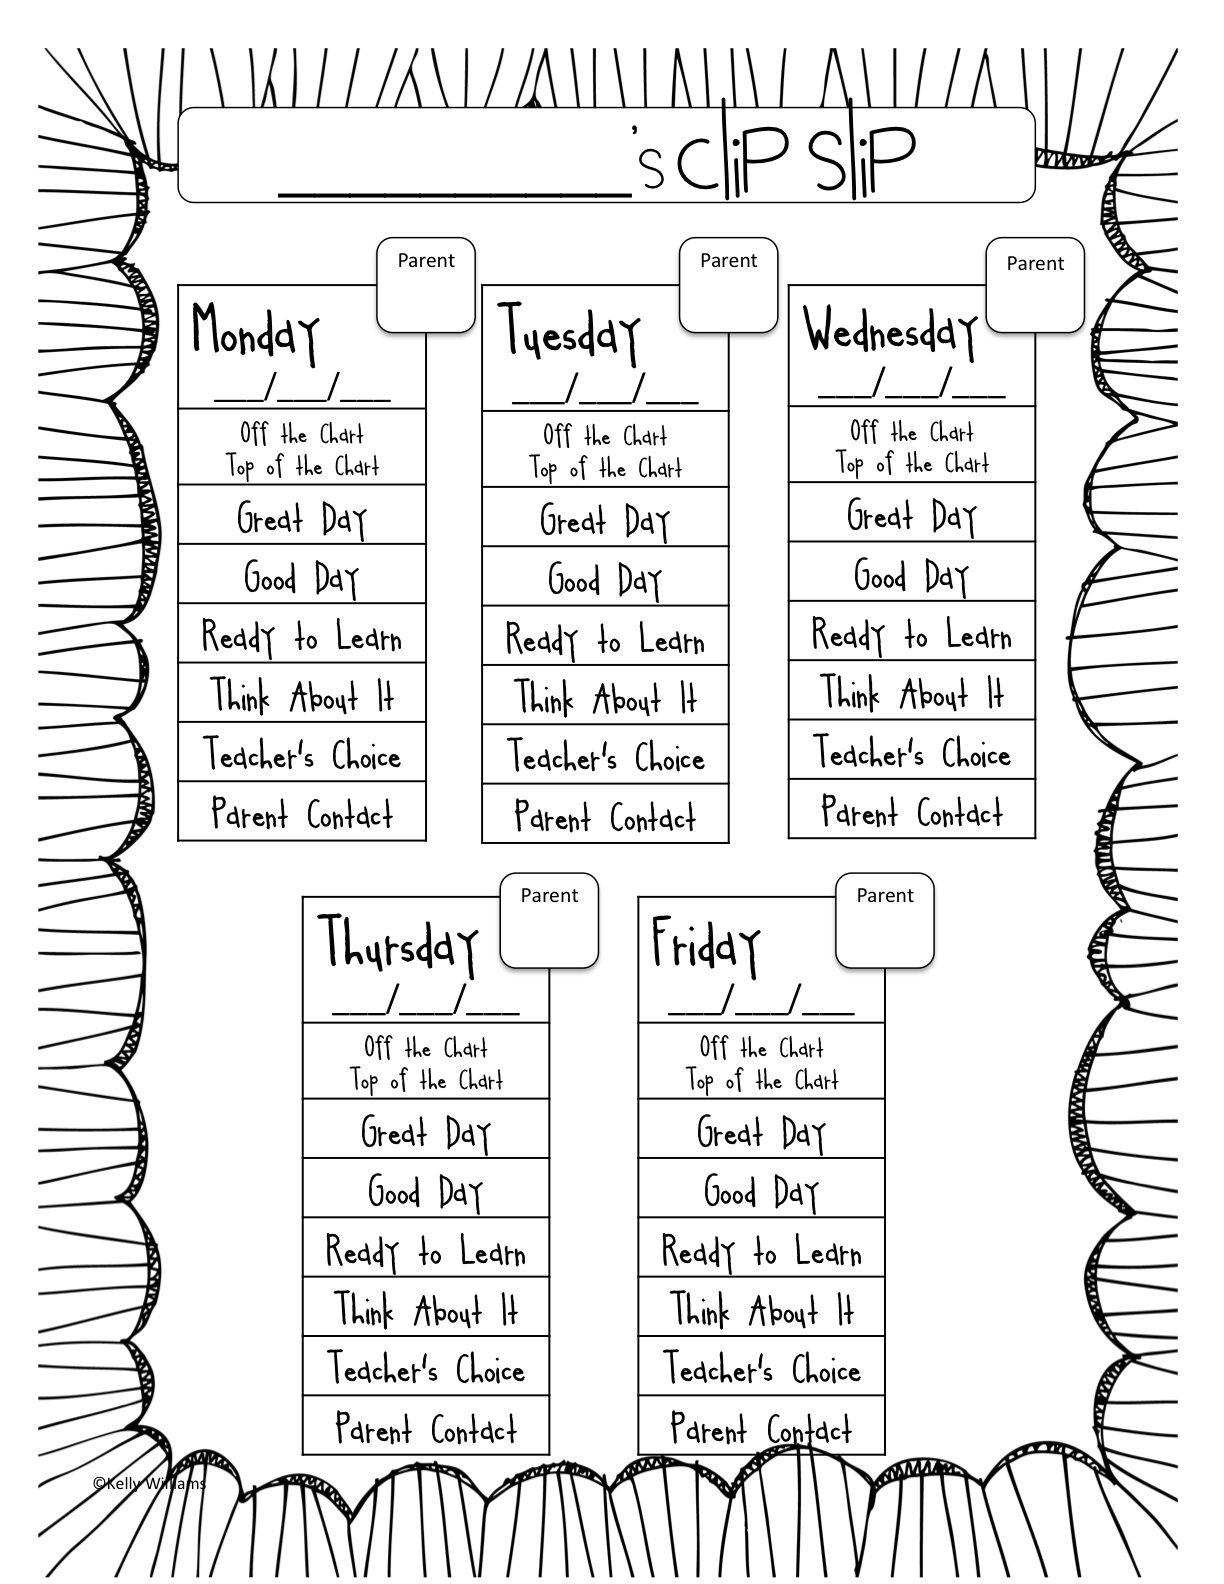 Classroom Management Ideas For First Grade ~ Sliding into second grade classroom management st nd